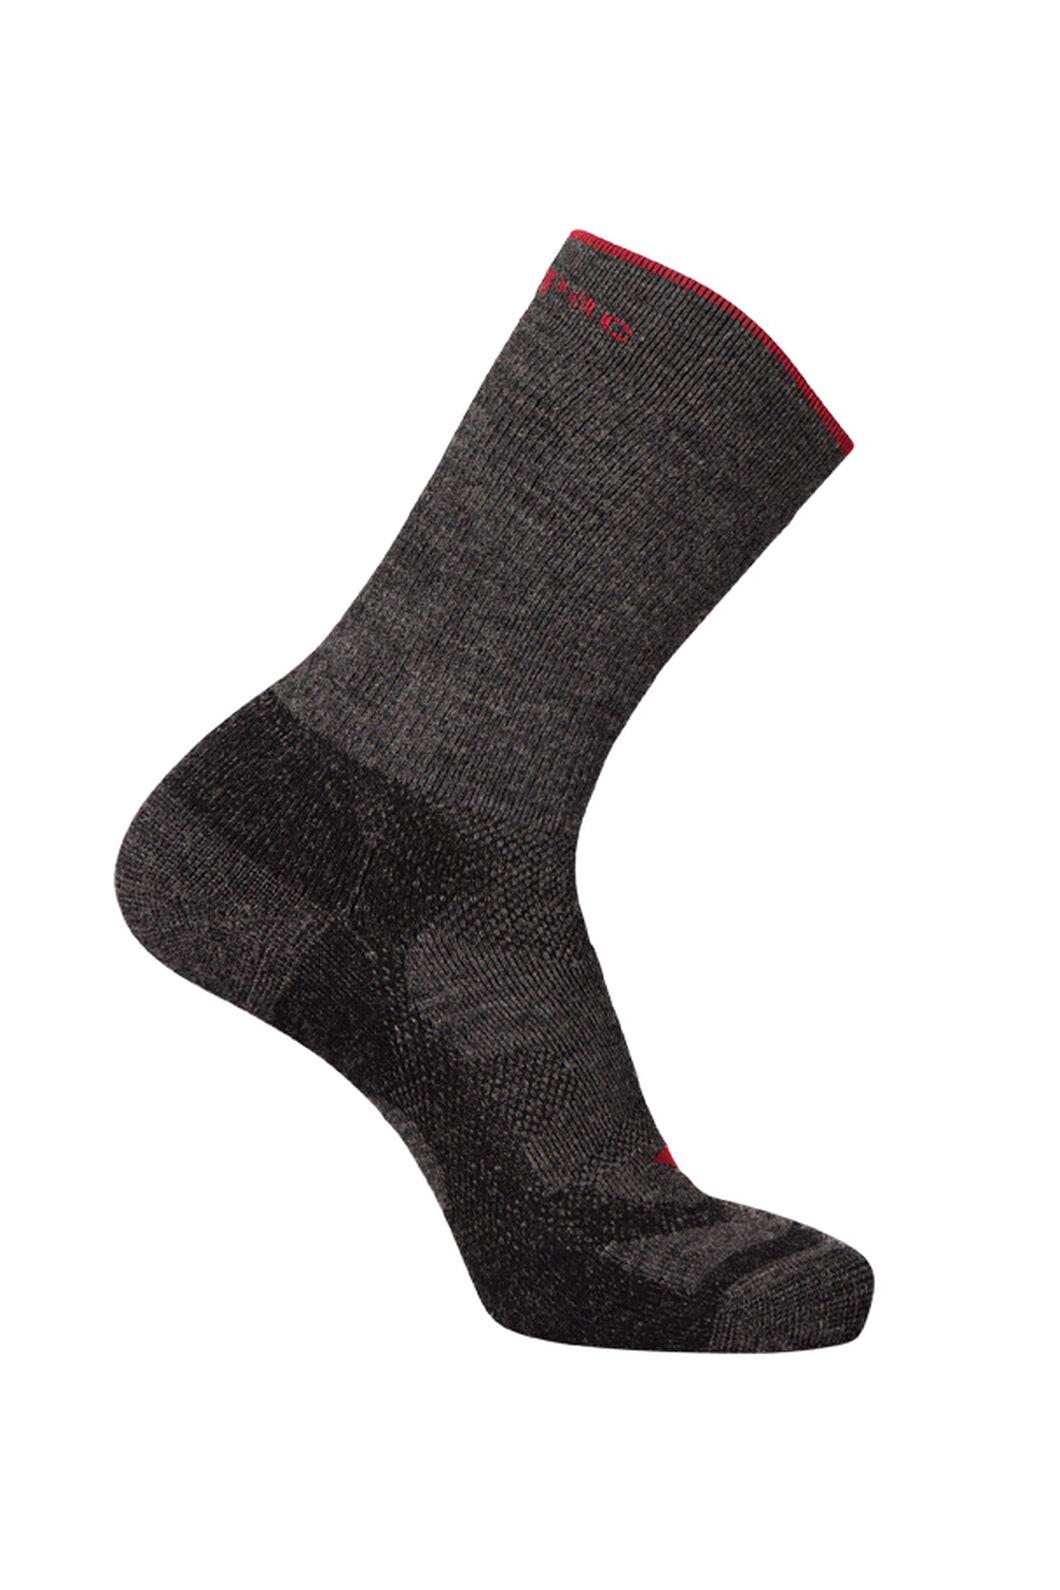 Macpac Merino Hiker Socks, Forged Iron Melange, hi-res